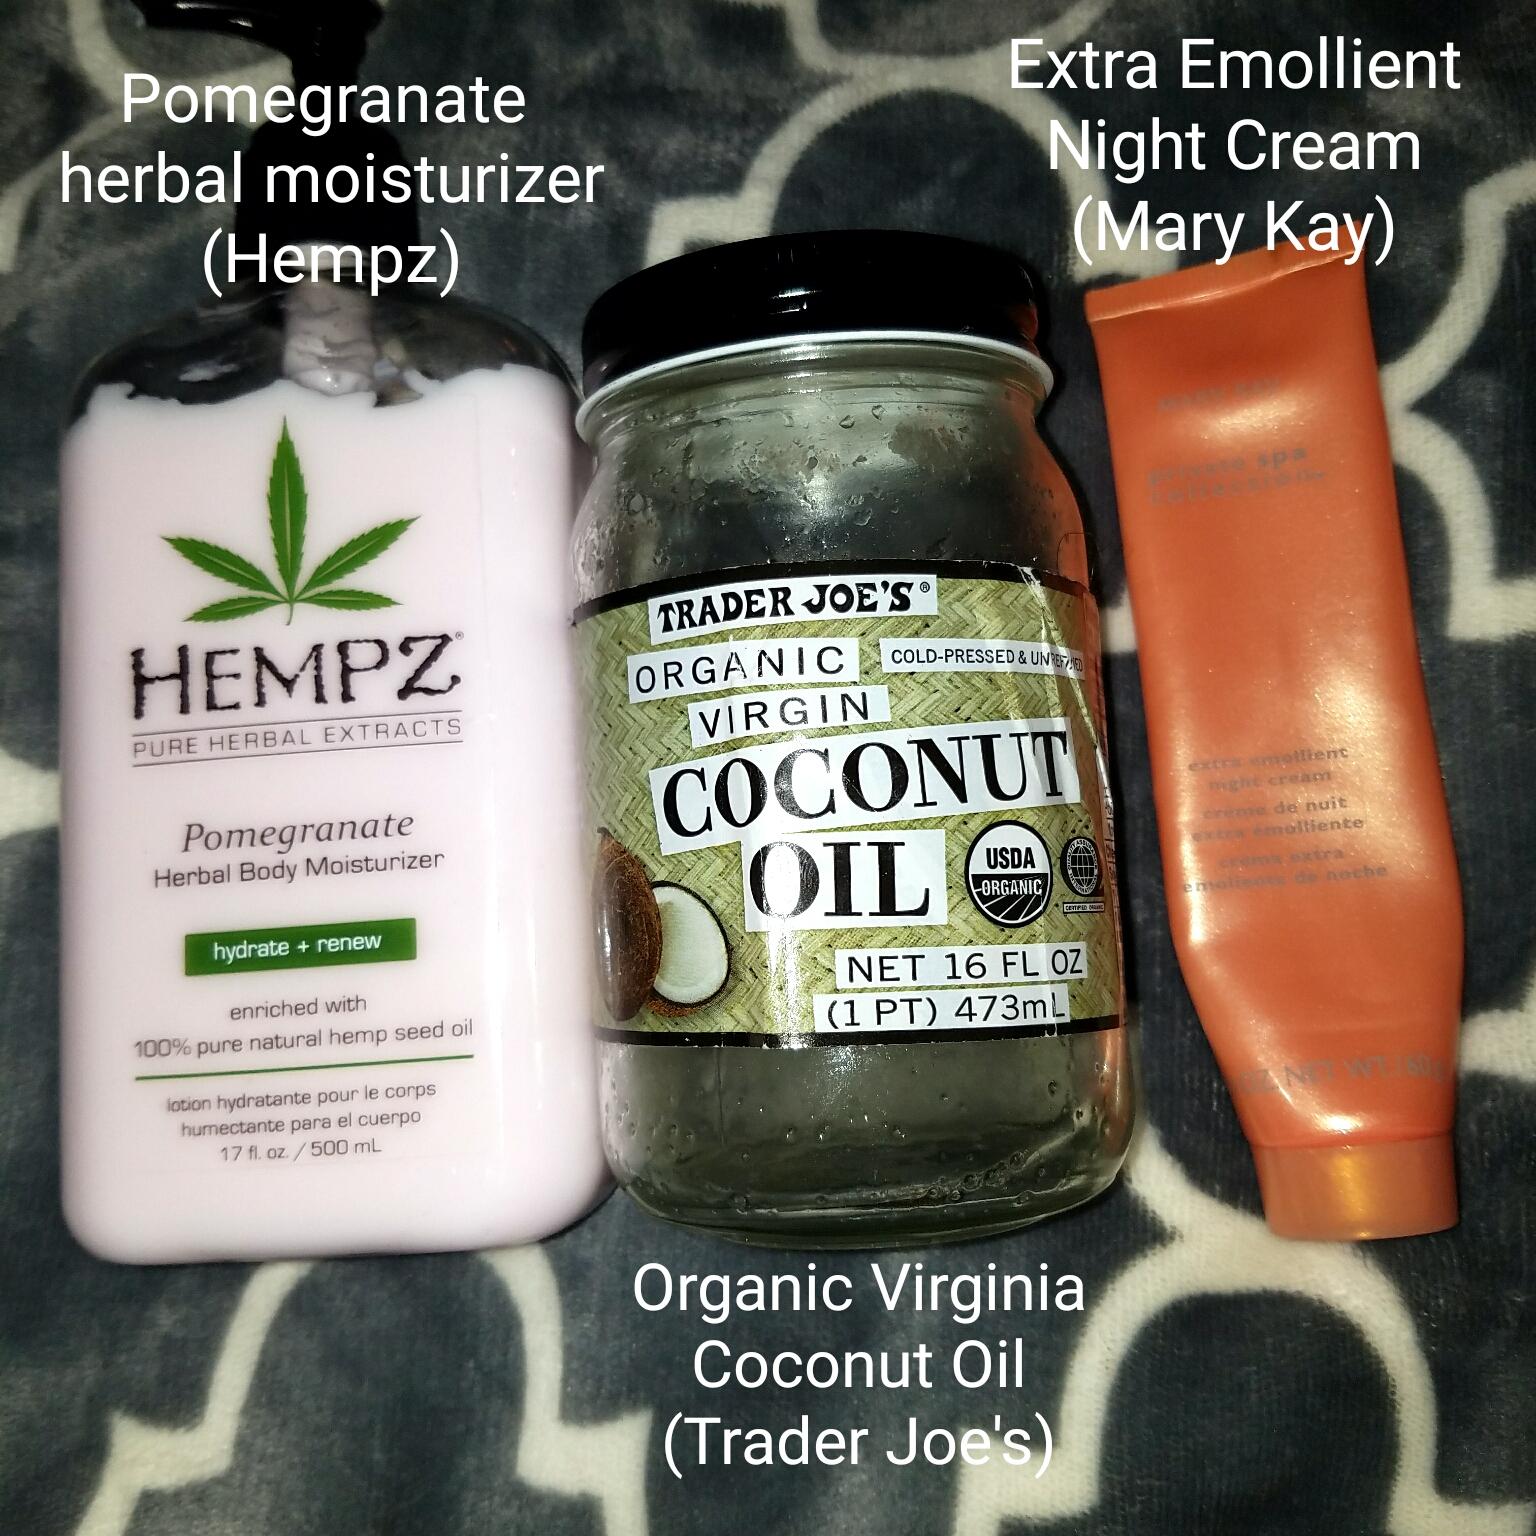 10 basic principles of autumn skin care